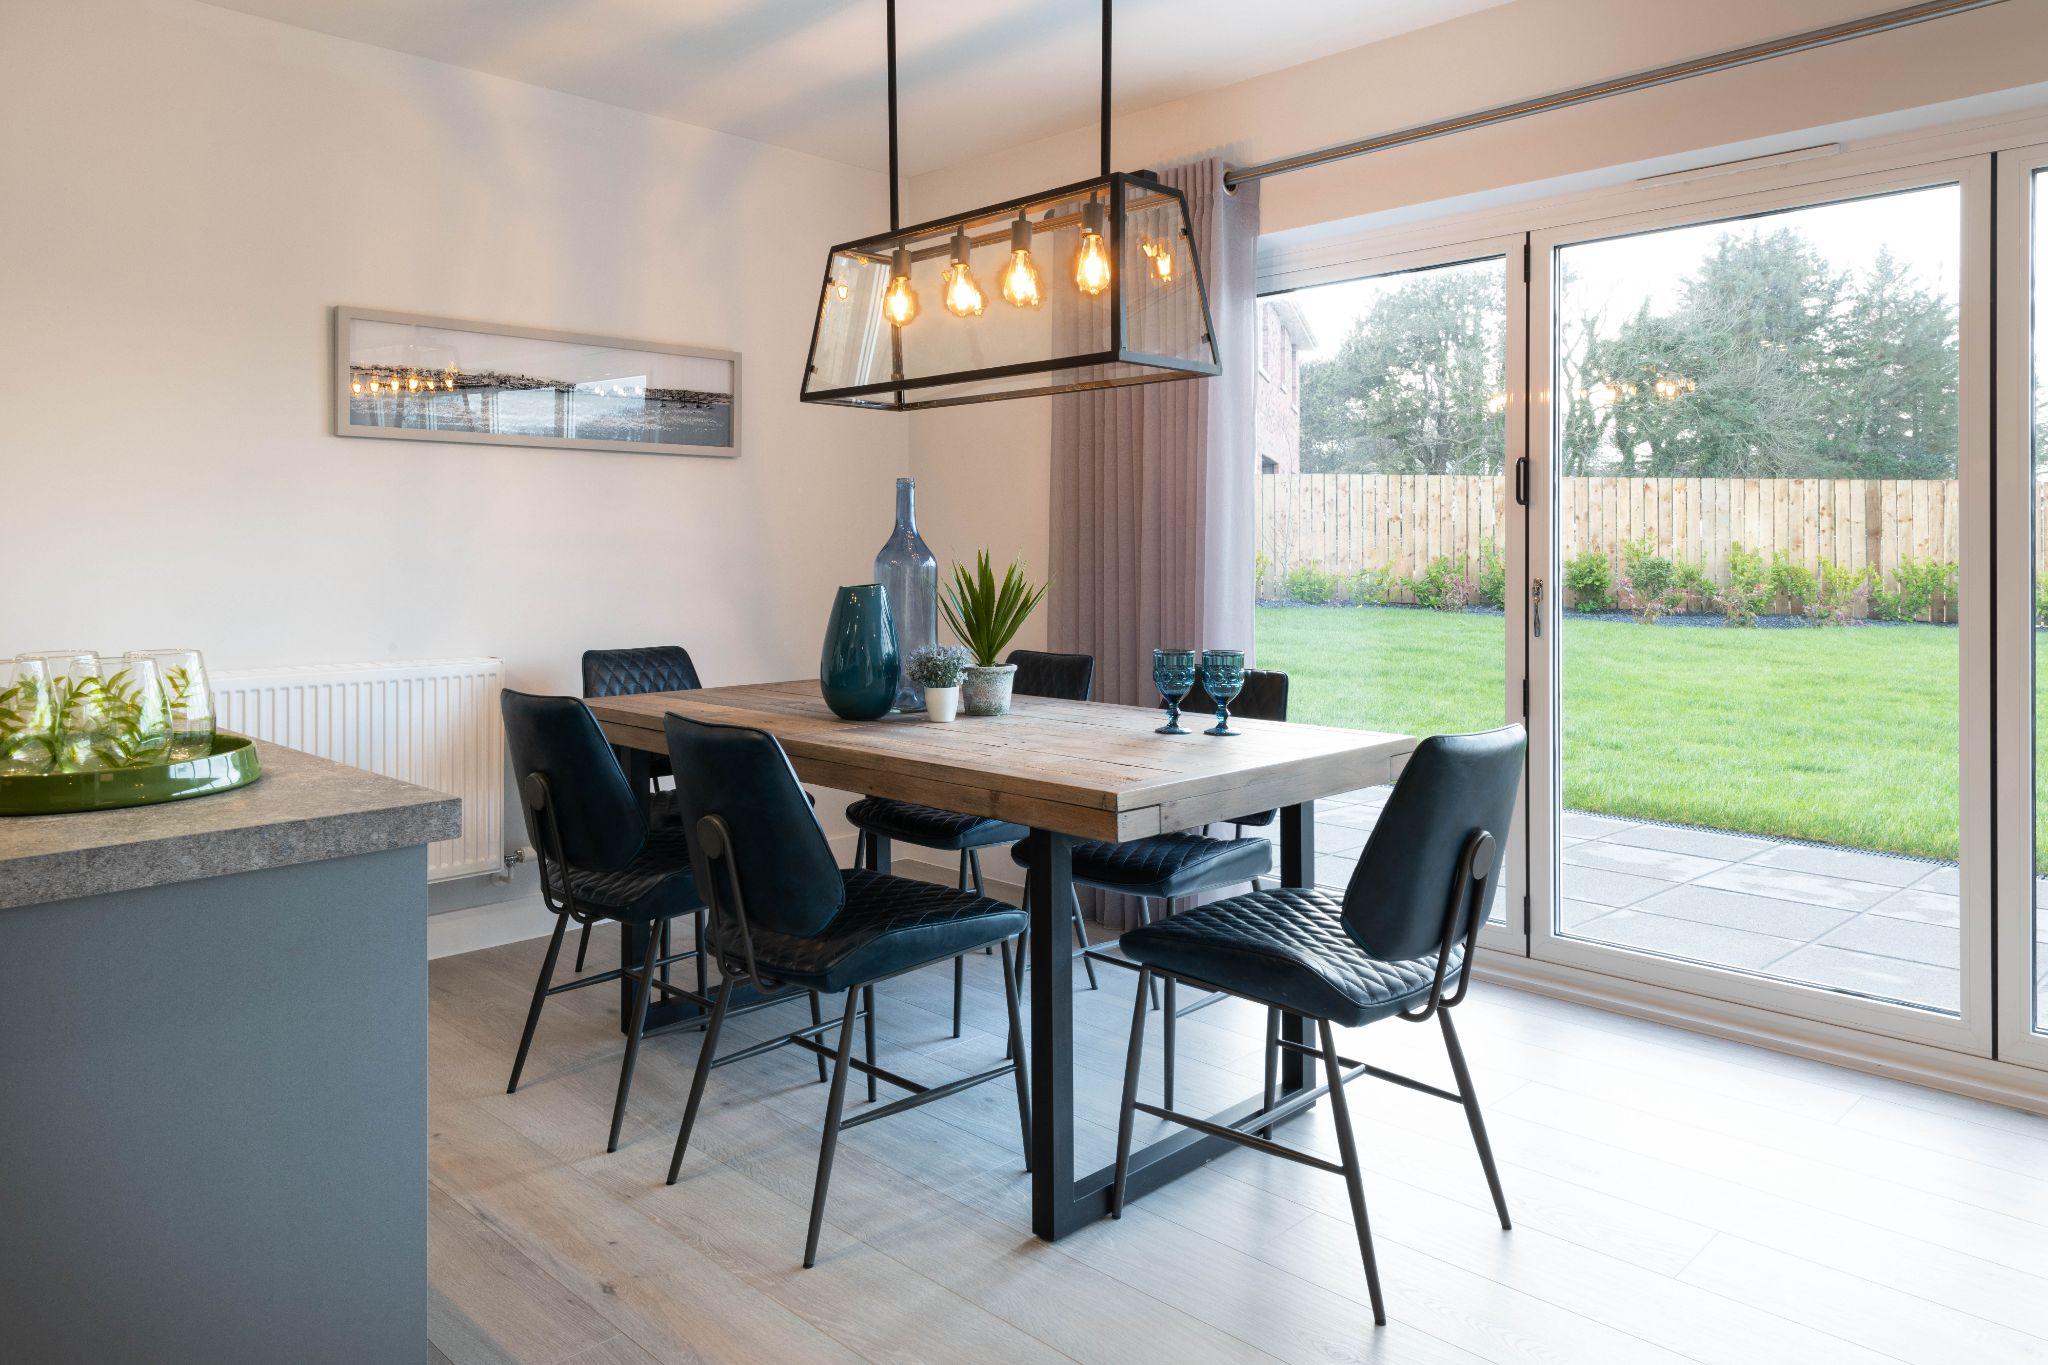 5 bedroom detached house For Sale in Glen Vine - Property photograph